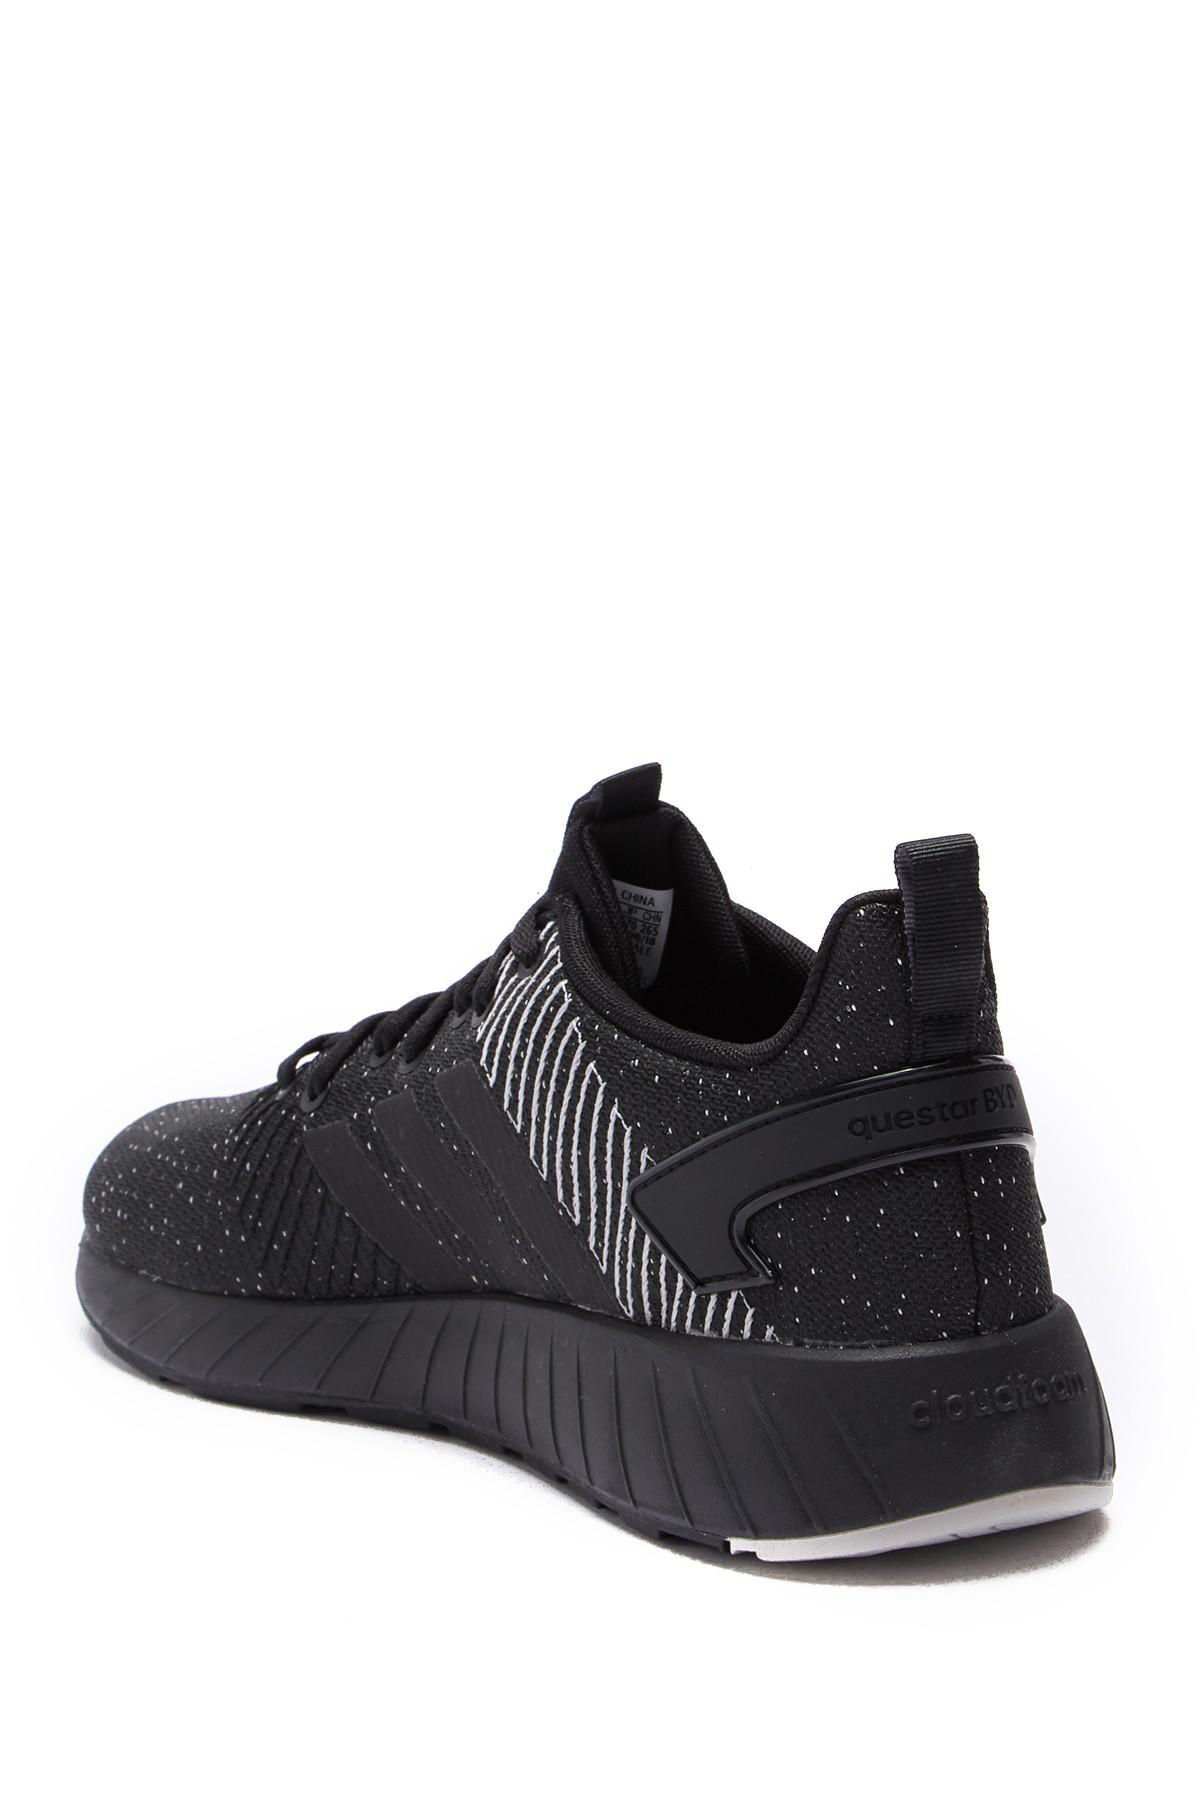 Adidas - Black Questar Byd Sneaker for Men - Lyst. View fullscreen c025d9de9